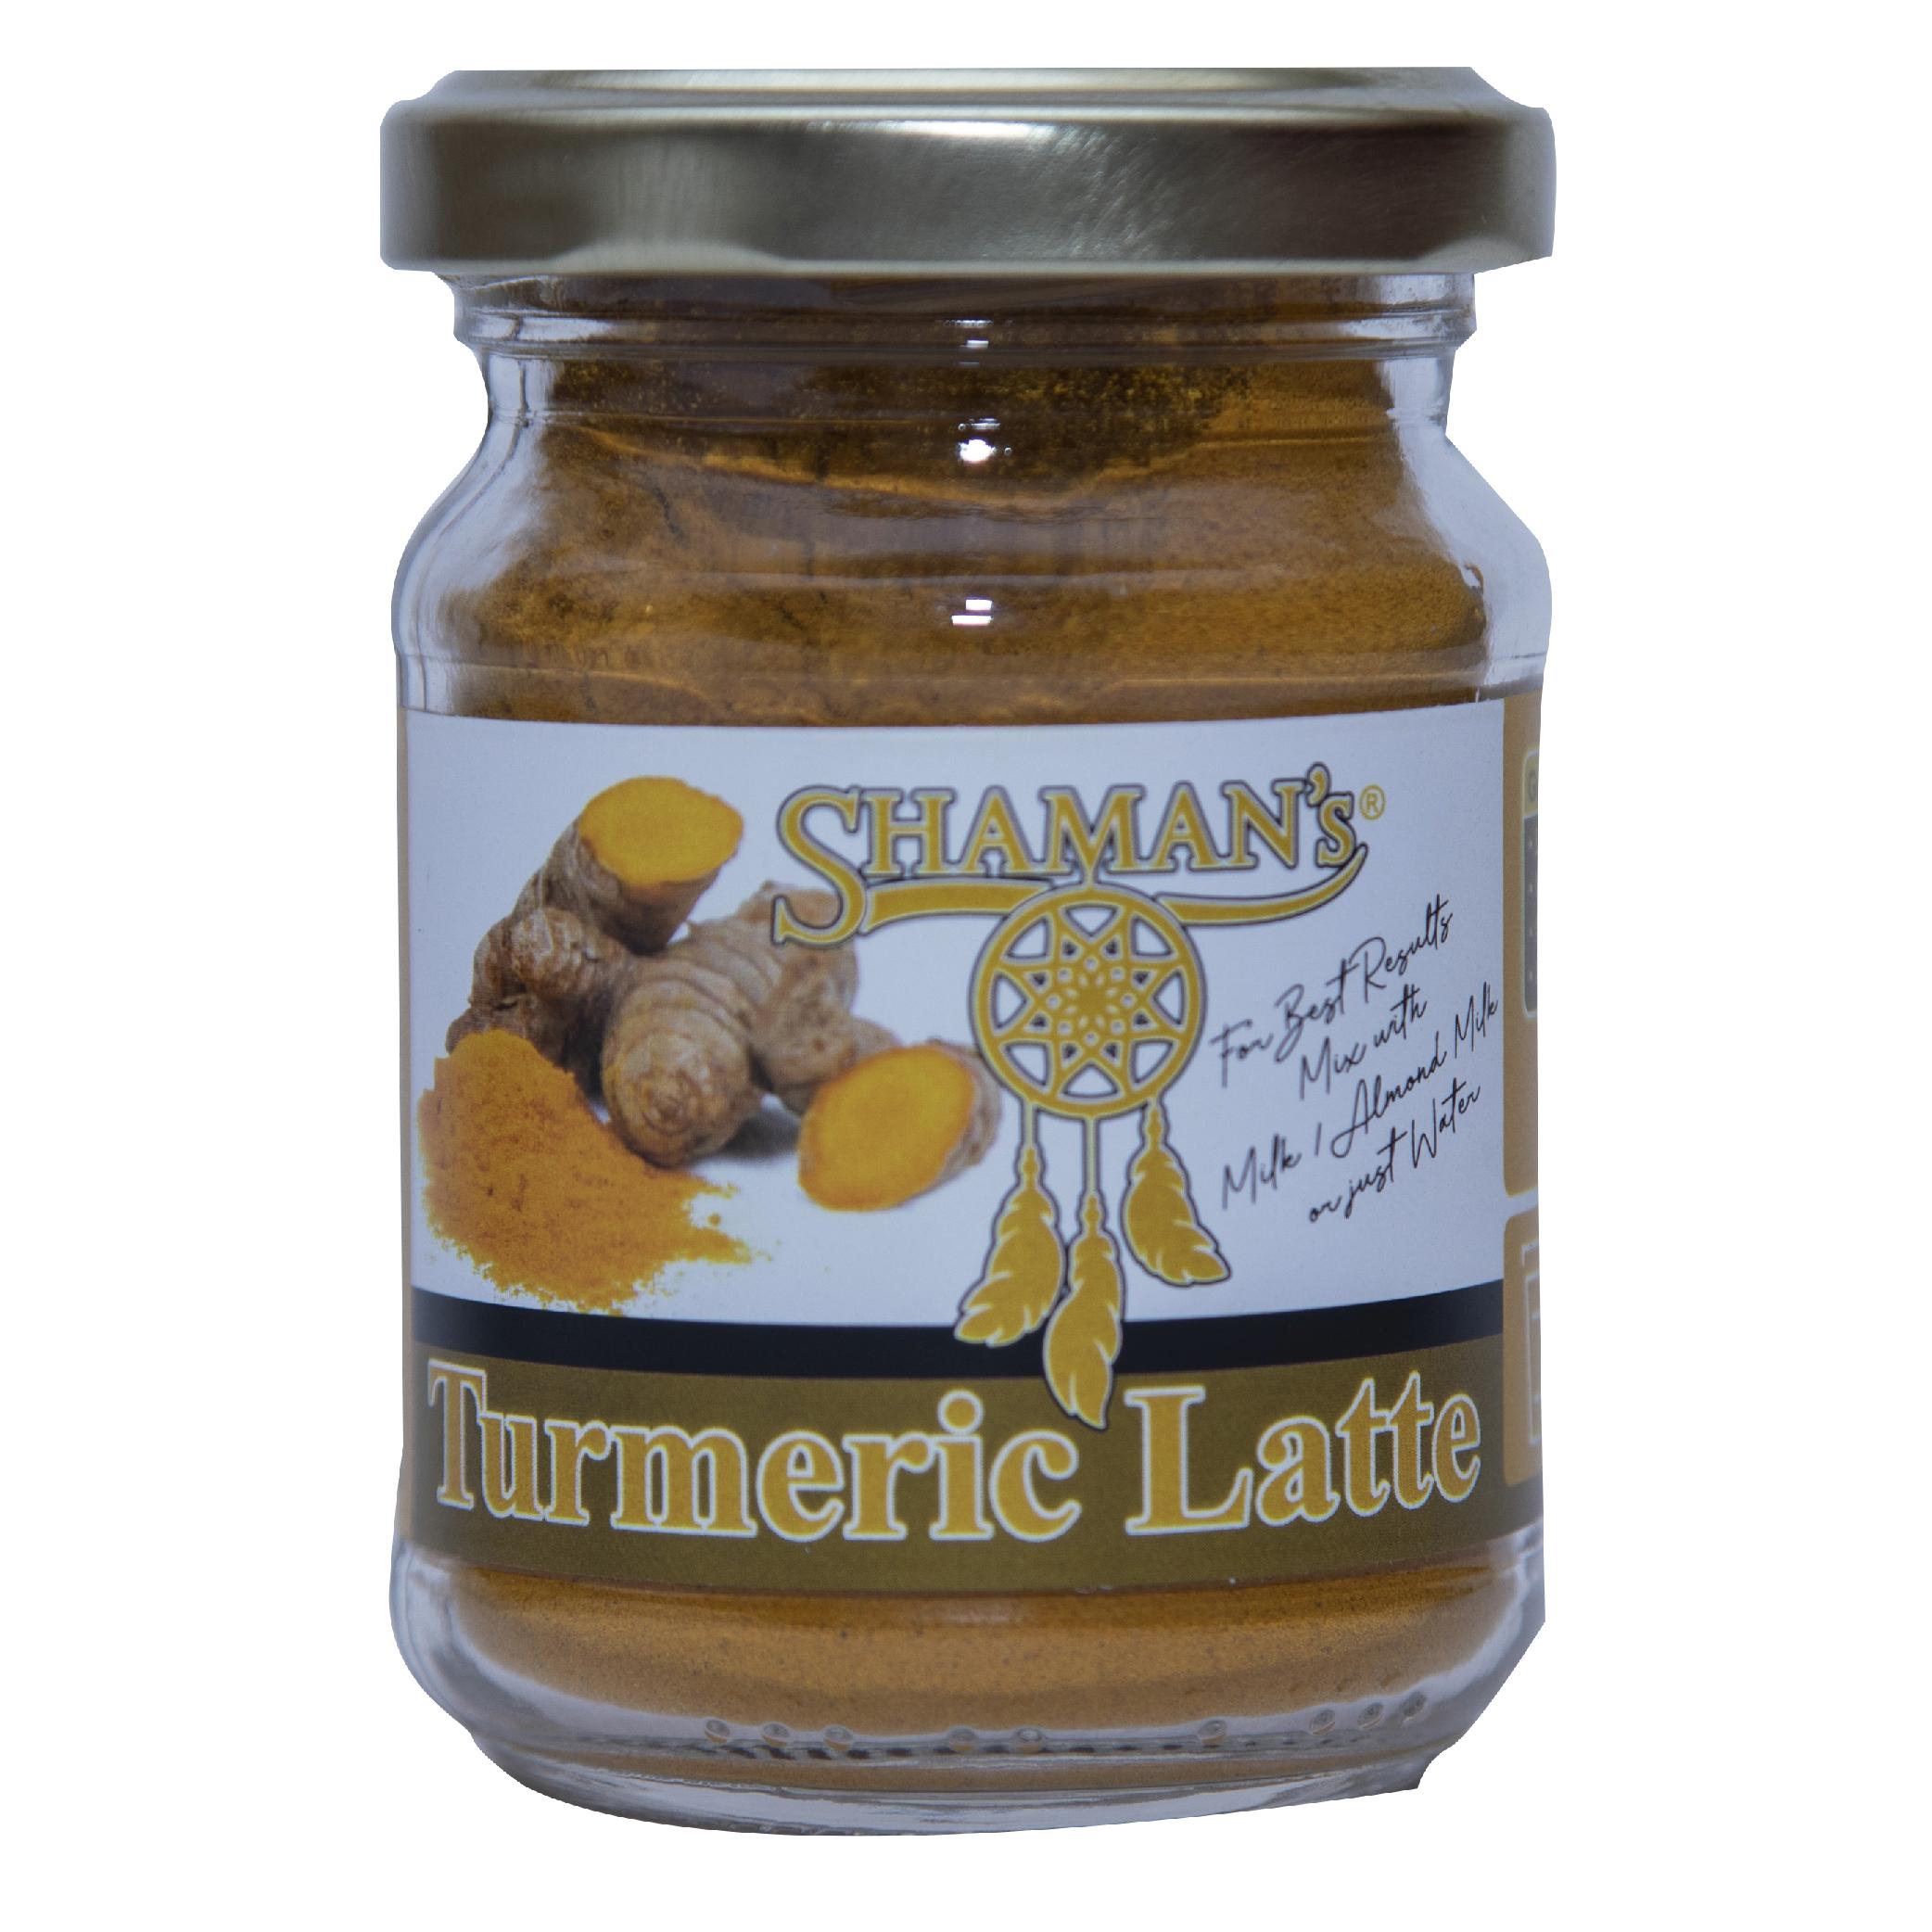 Shaman's Turmeric Latte